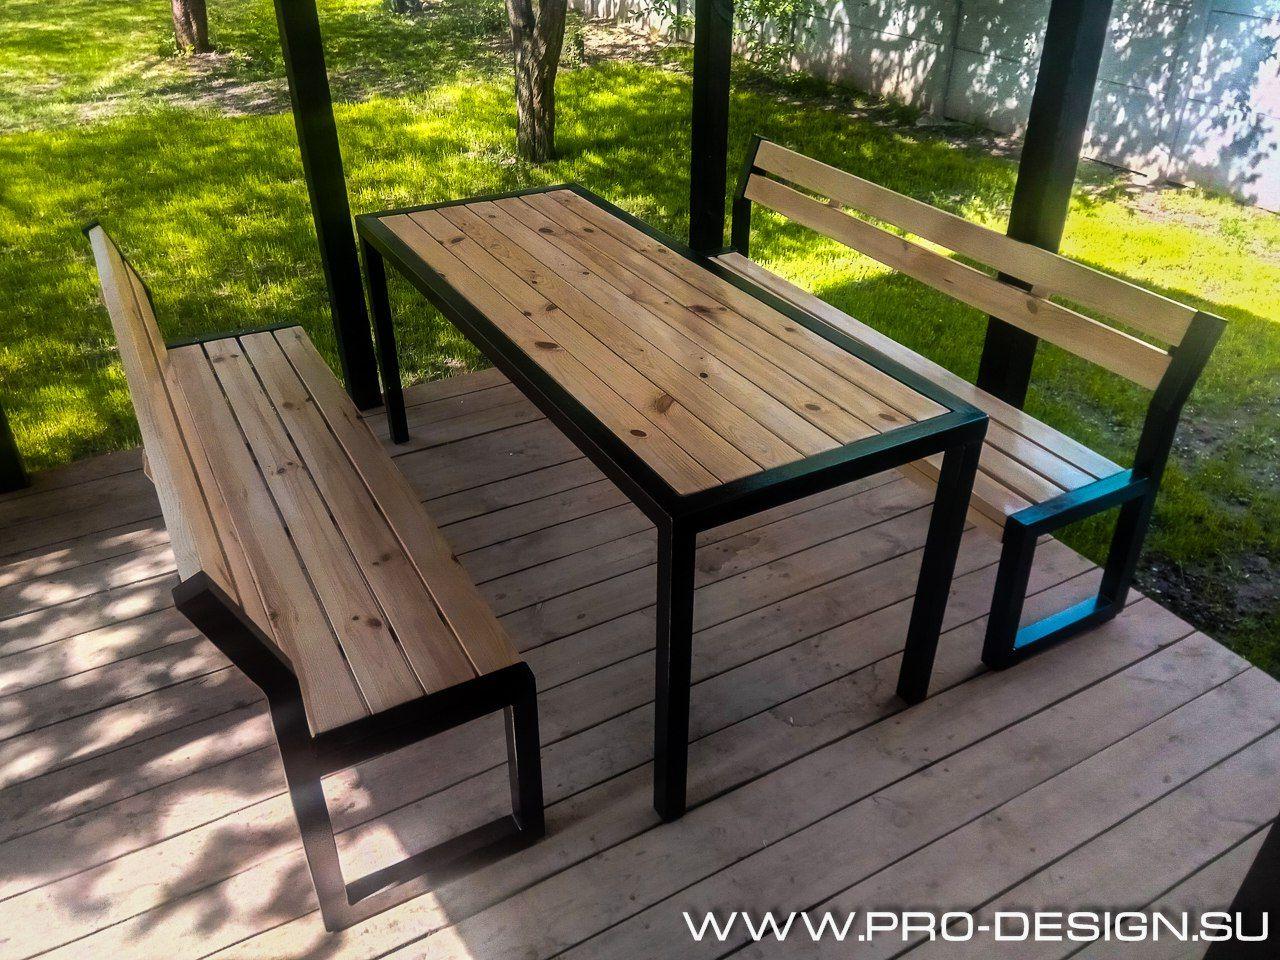 Table Bois Metal Exterieur Лофт – 9 fotek | vk | Металлическая мебель, Мебель из стали